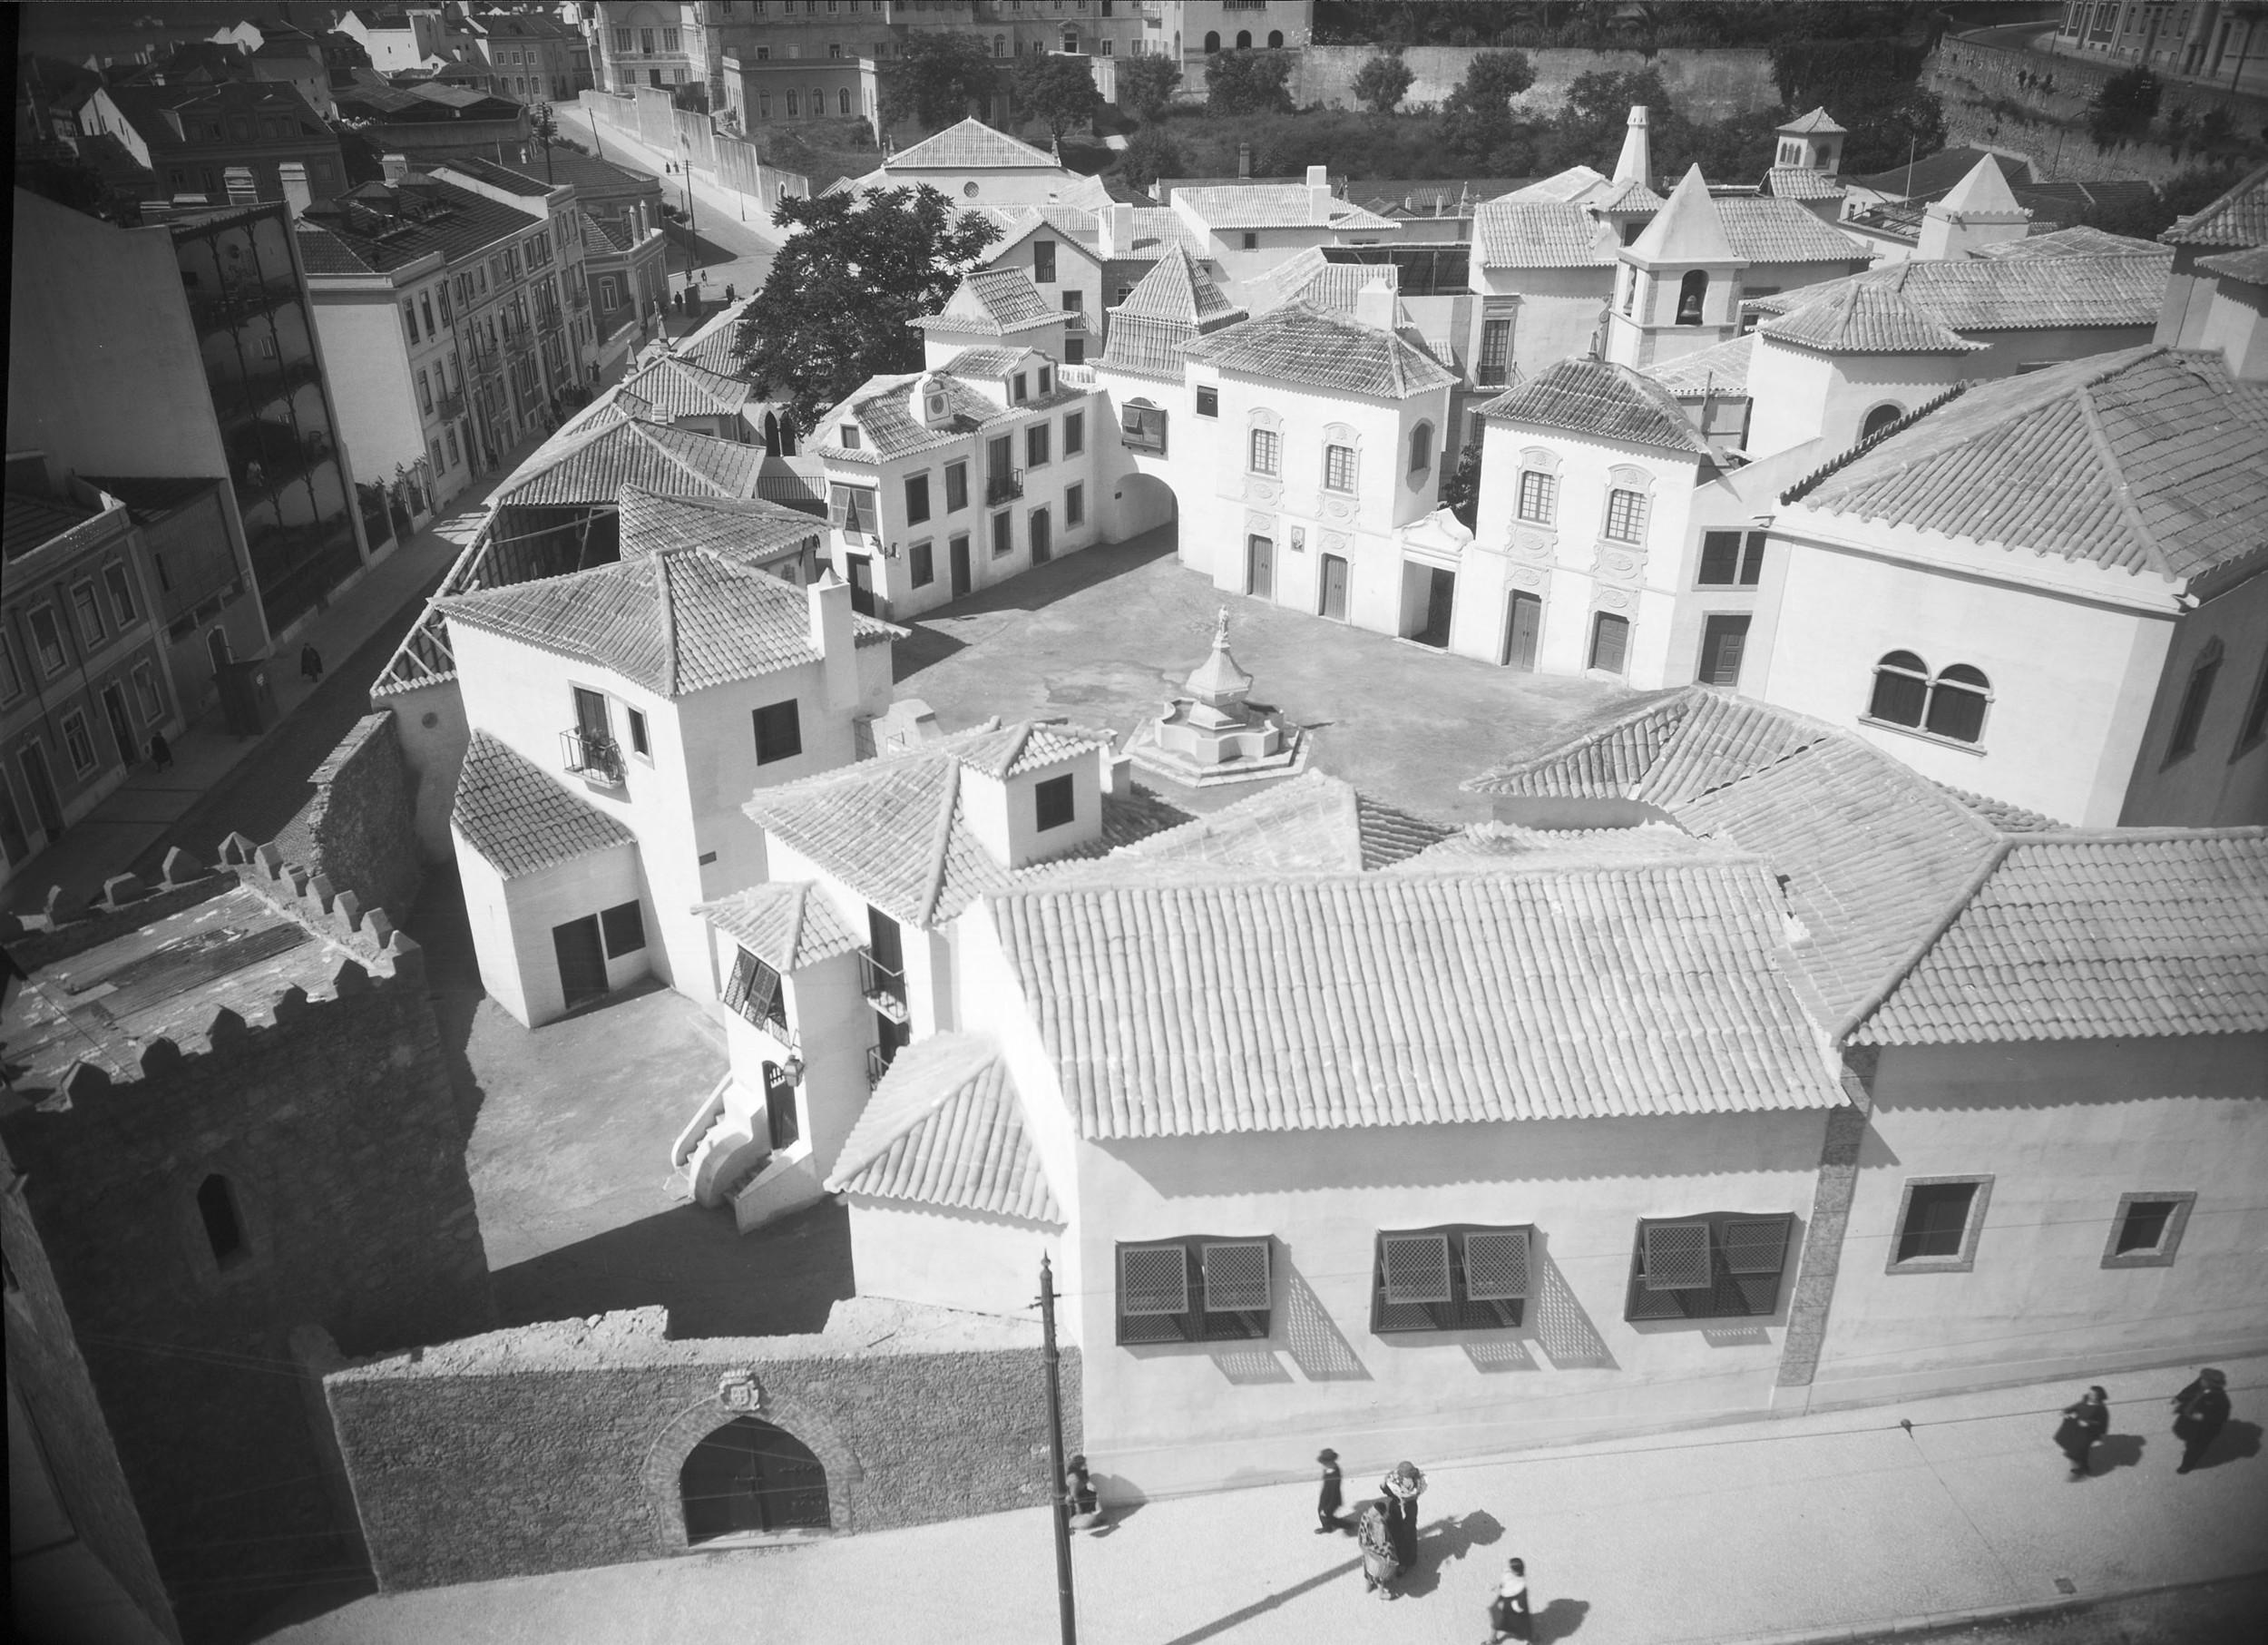 CFT003_102149_1935_Festas_da_Cidade.jpg